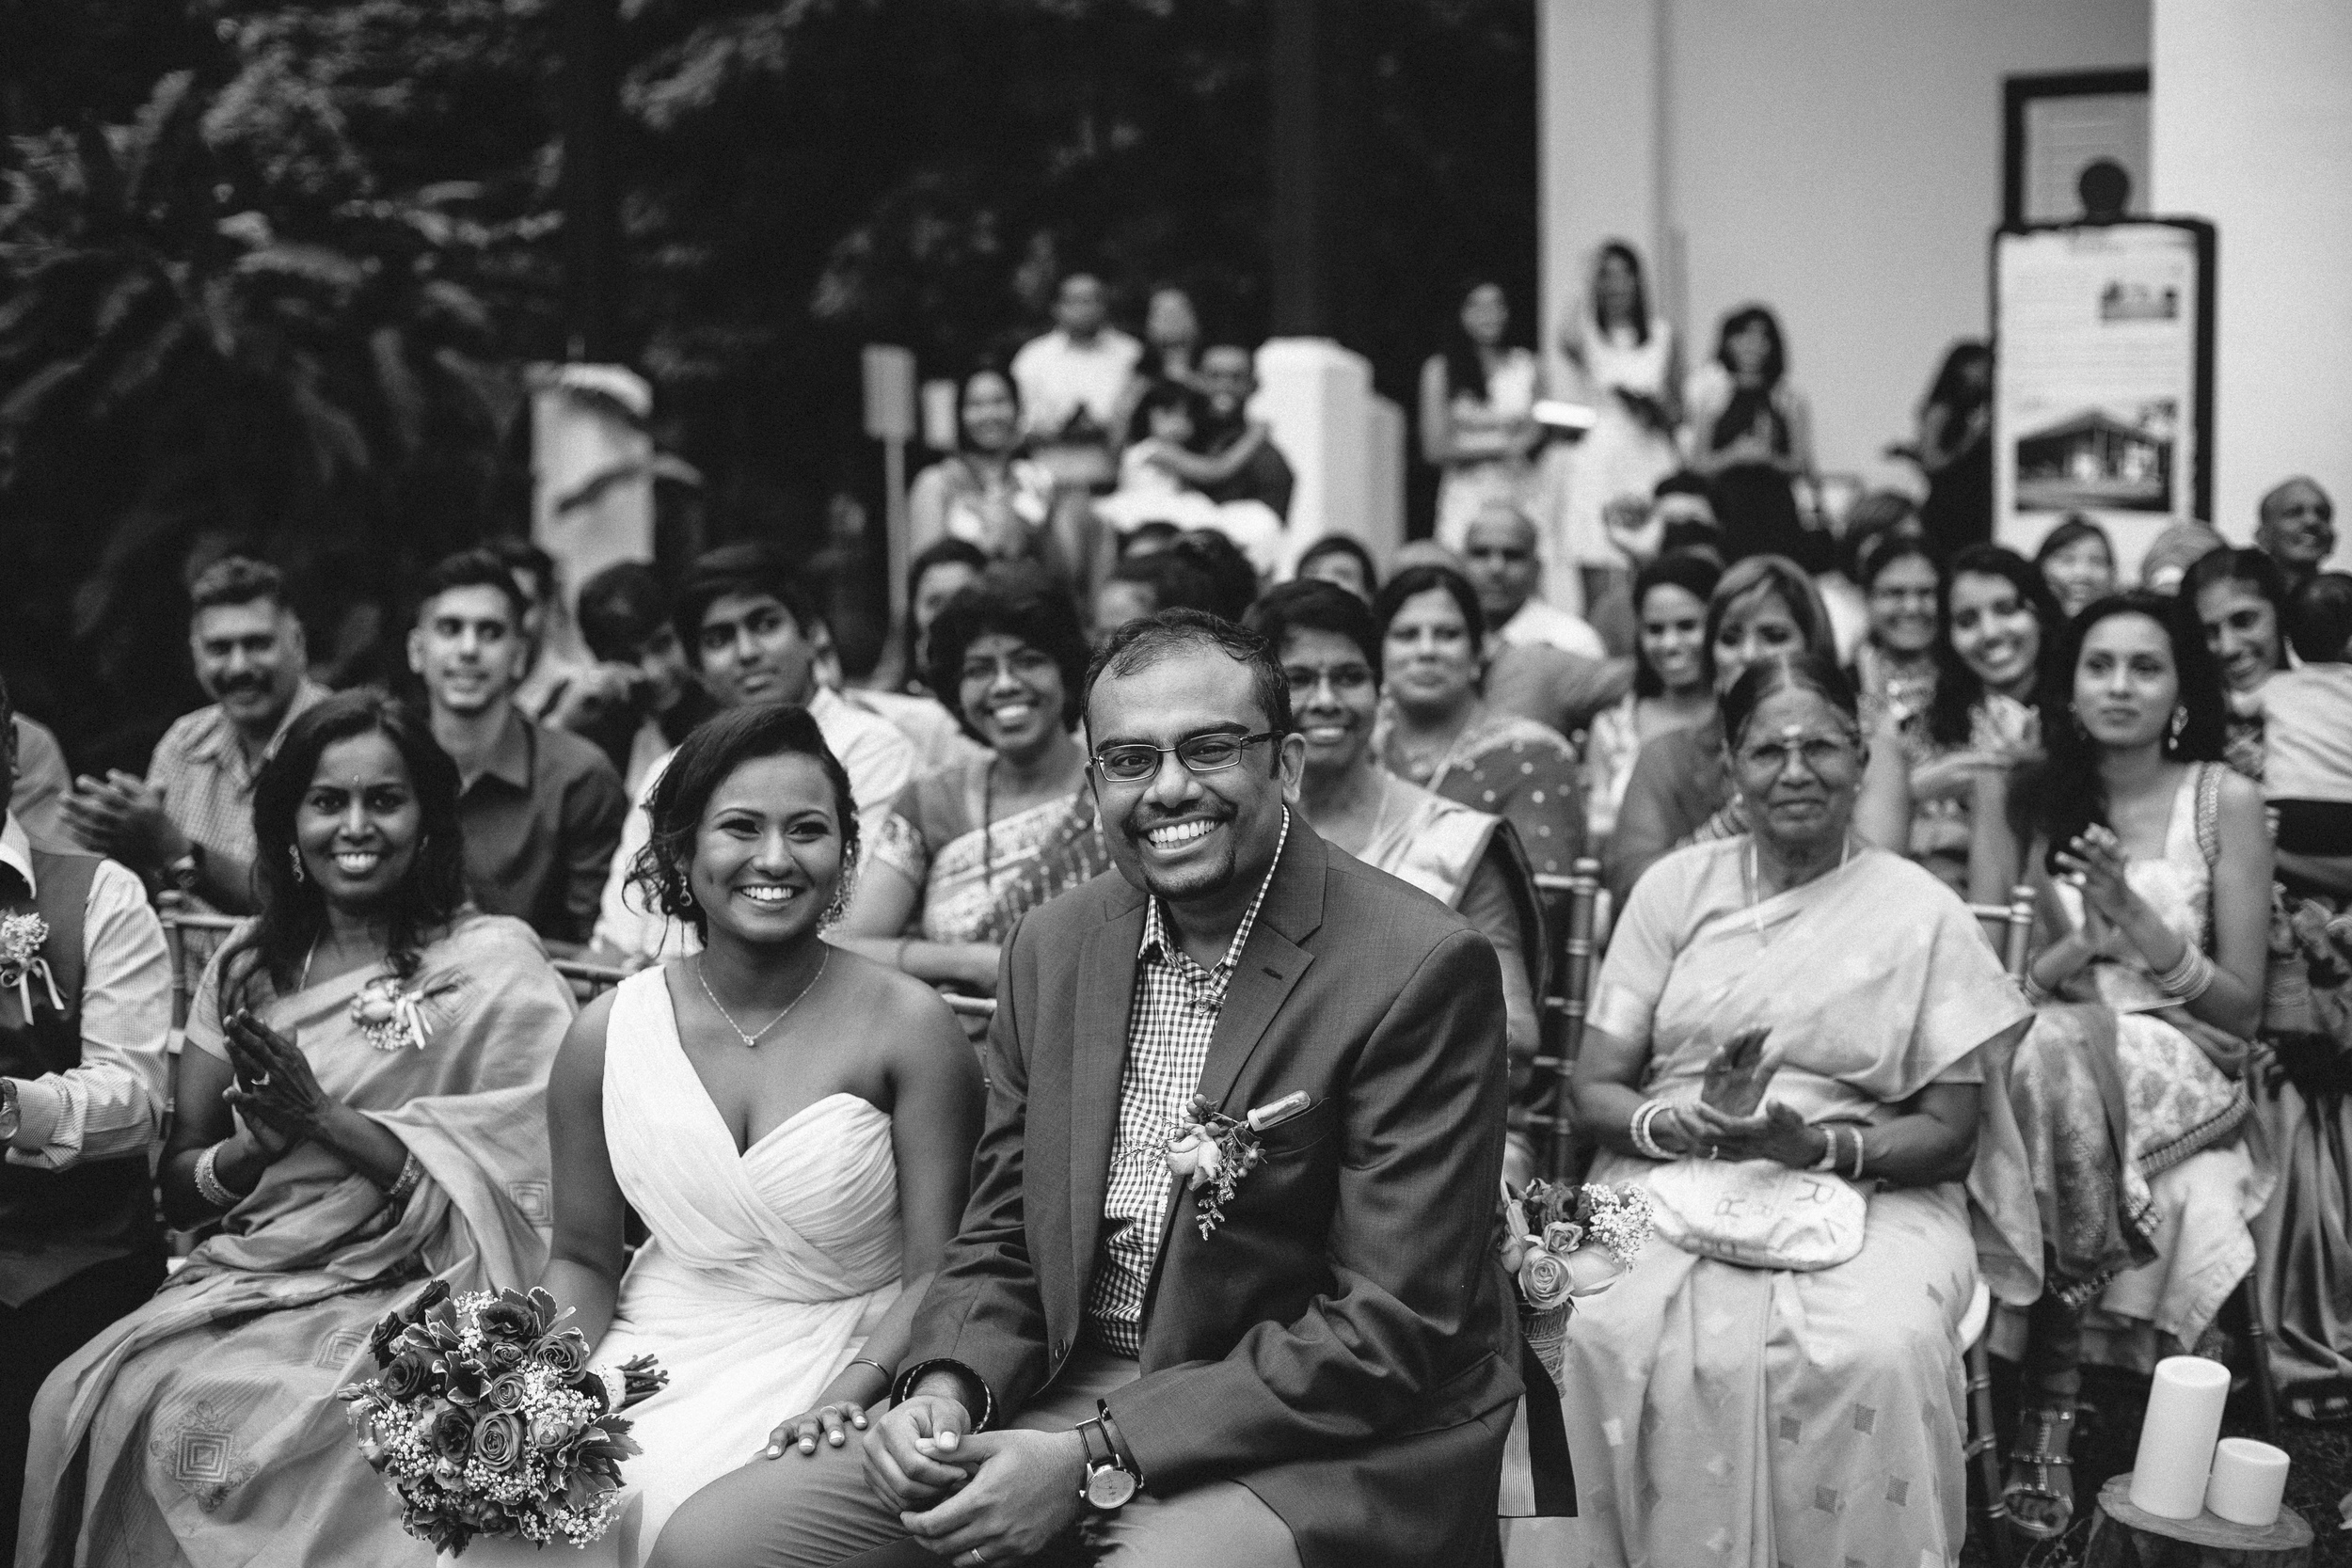 singapore-wedding-photographer-malay-indian-pre-wedding-travel-wmt-2015-69.jpg